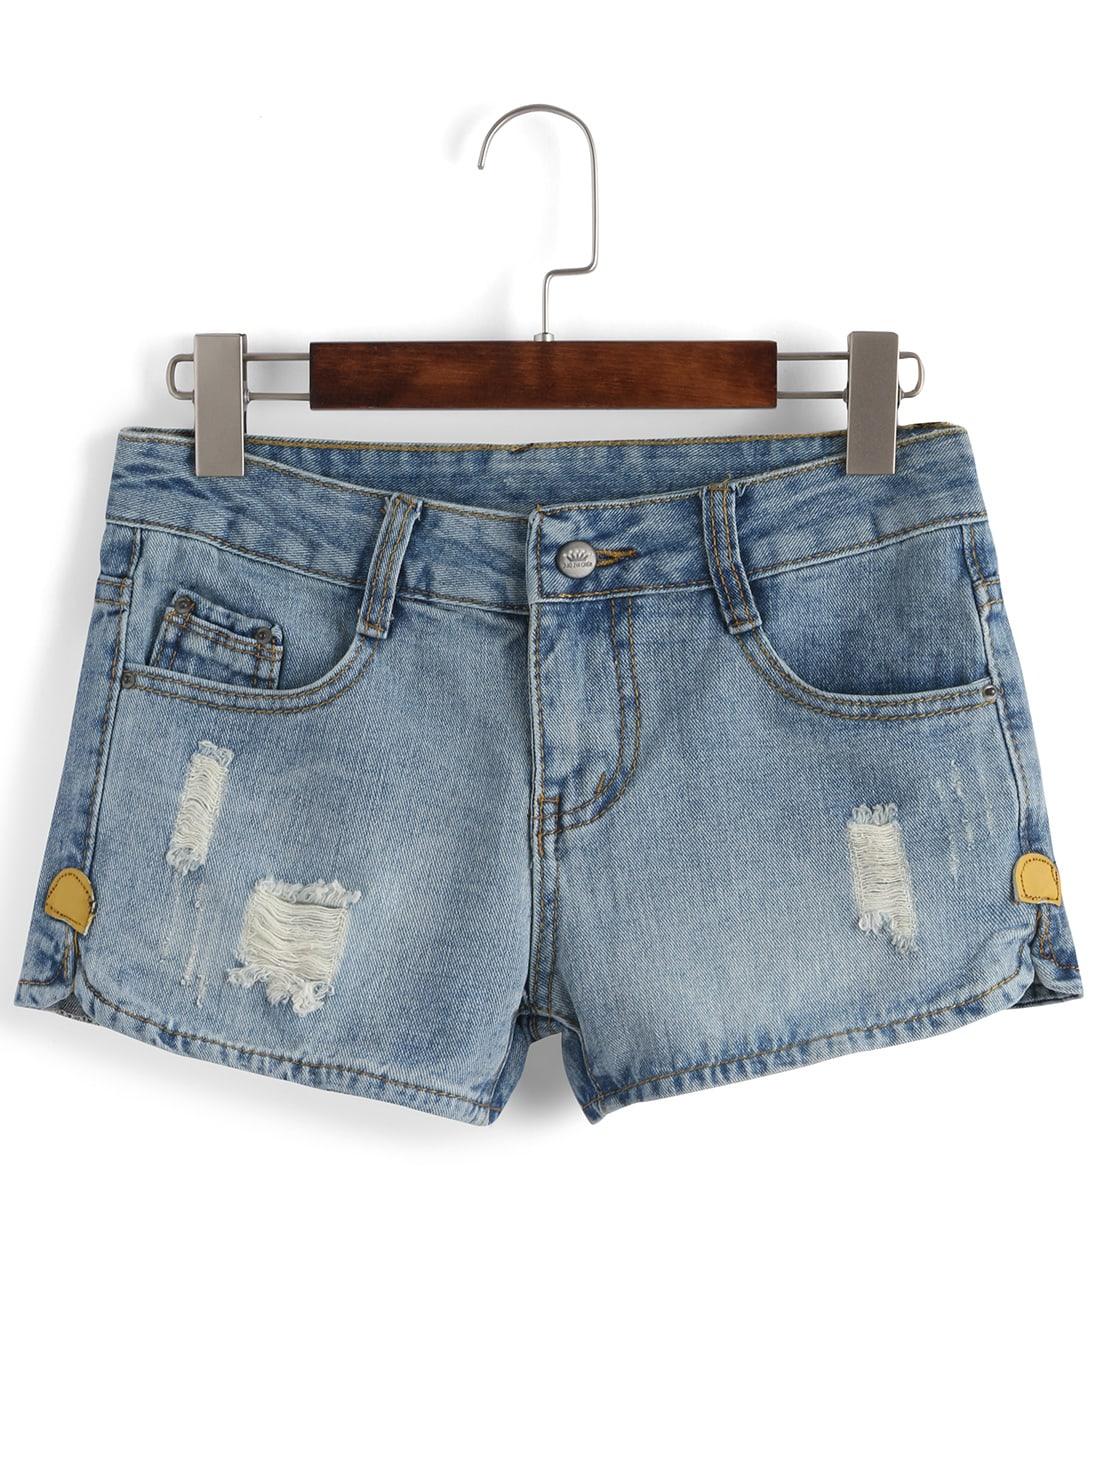 Ripped Denim Blue Shorts -SheIn(Sheinside)